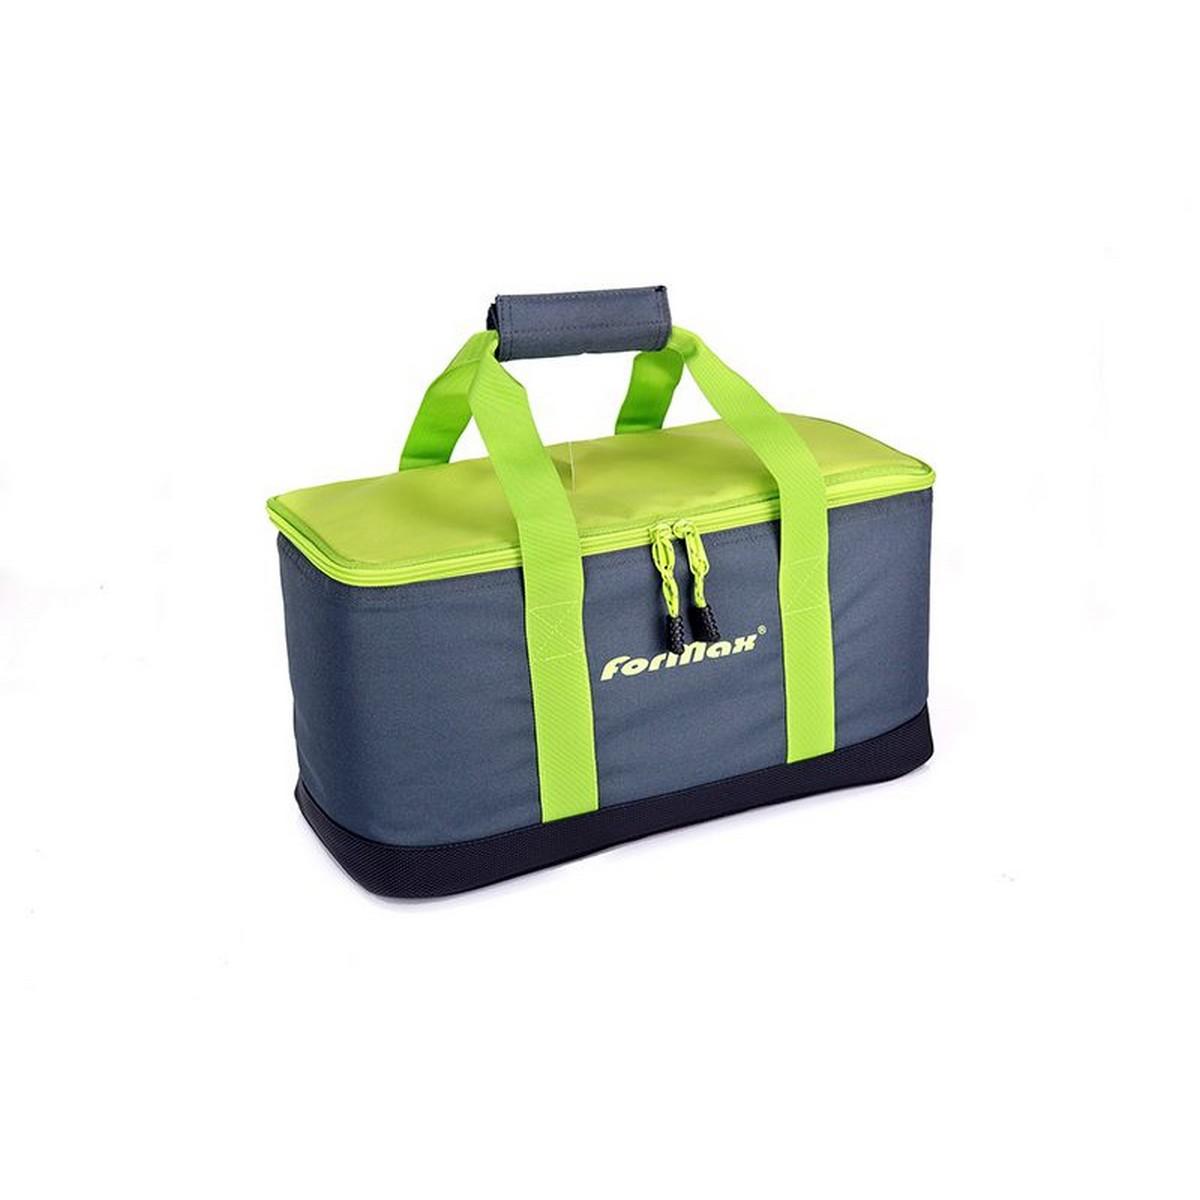 ef1fc0bd4f7 Риболовна хладилна чанта ForMax FX-64342